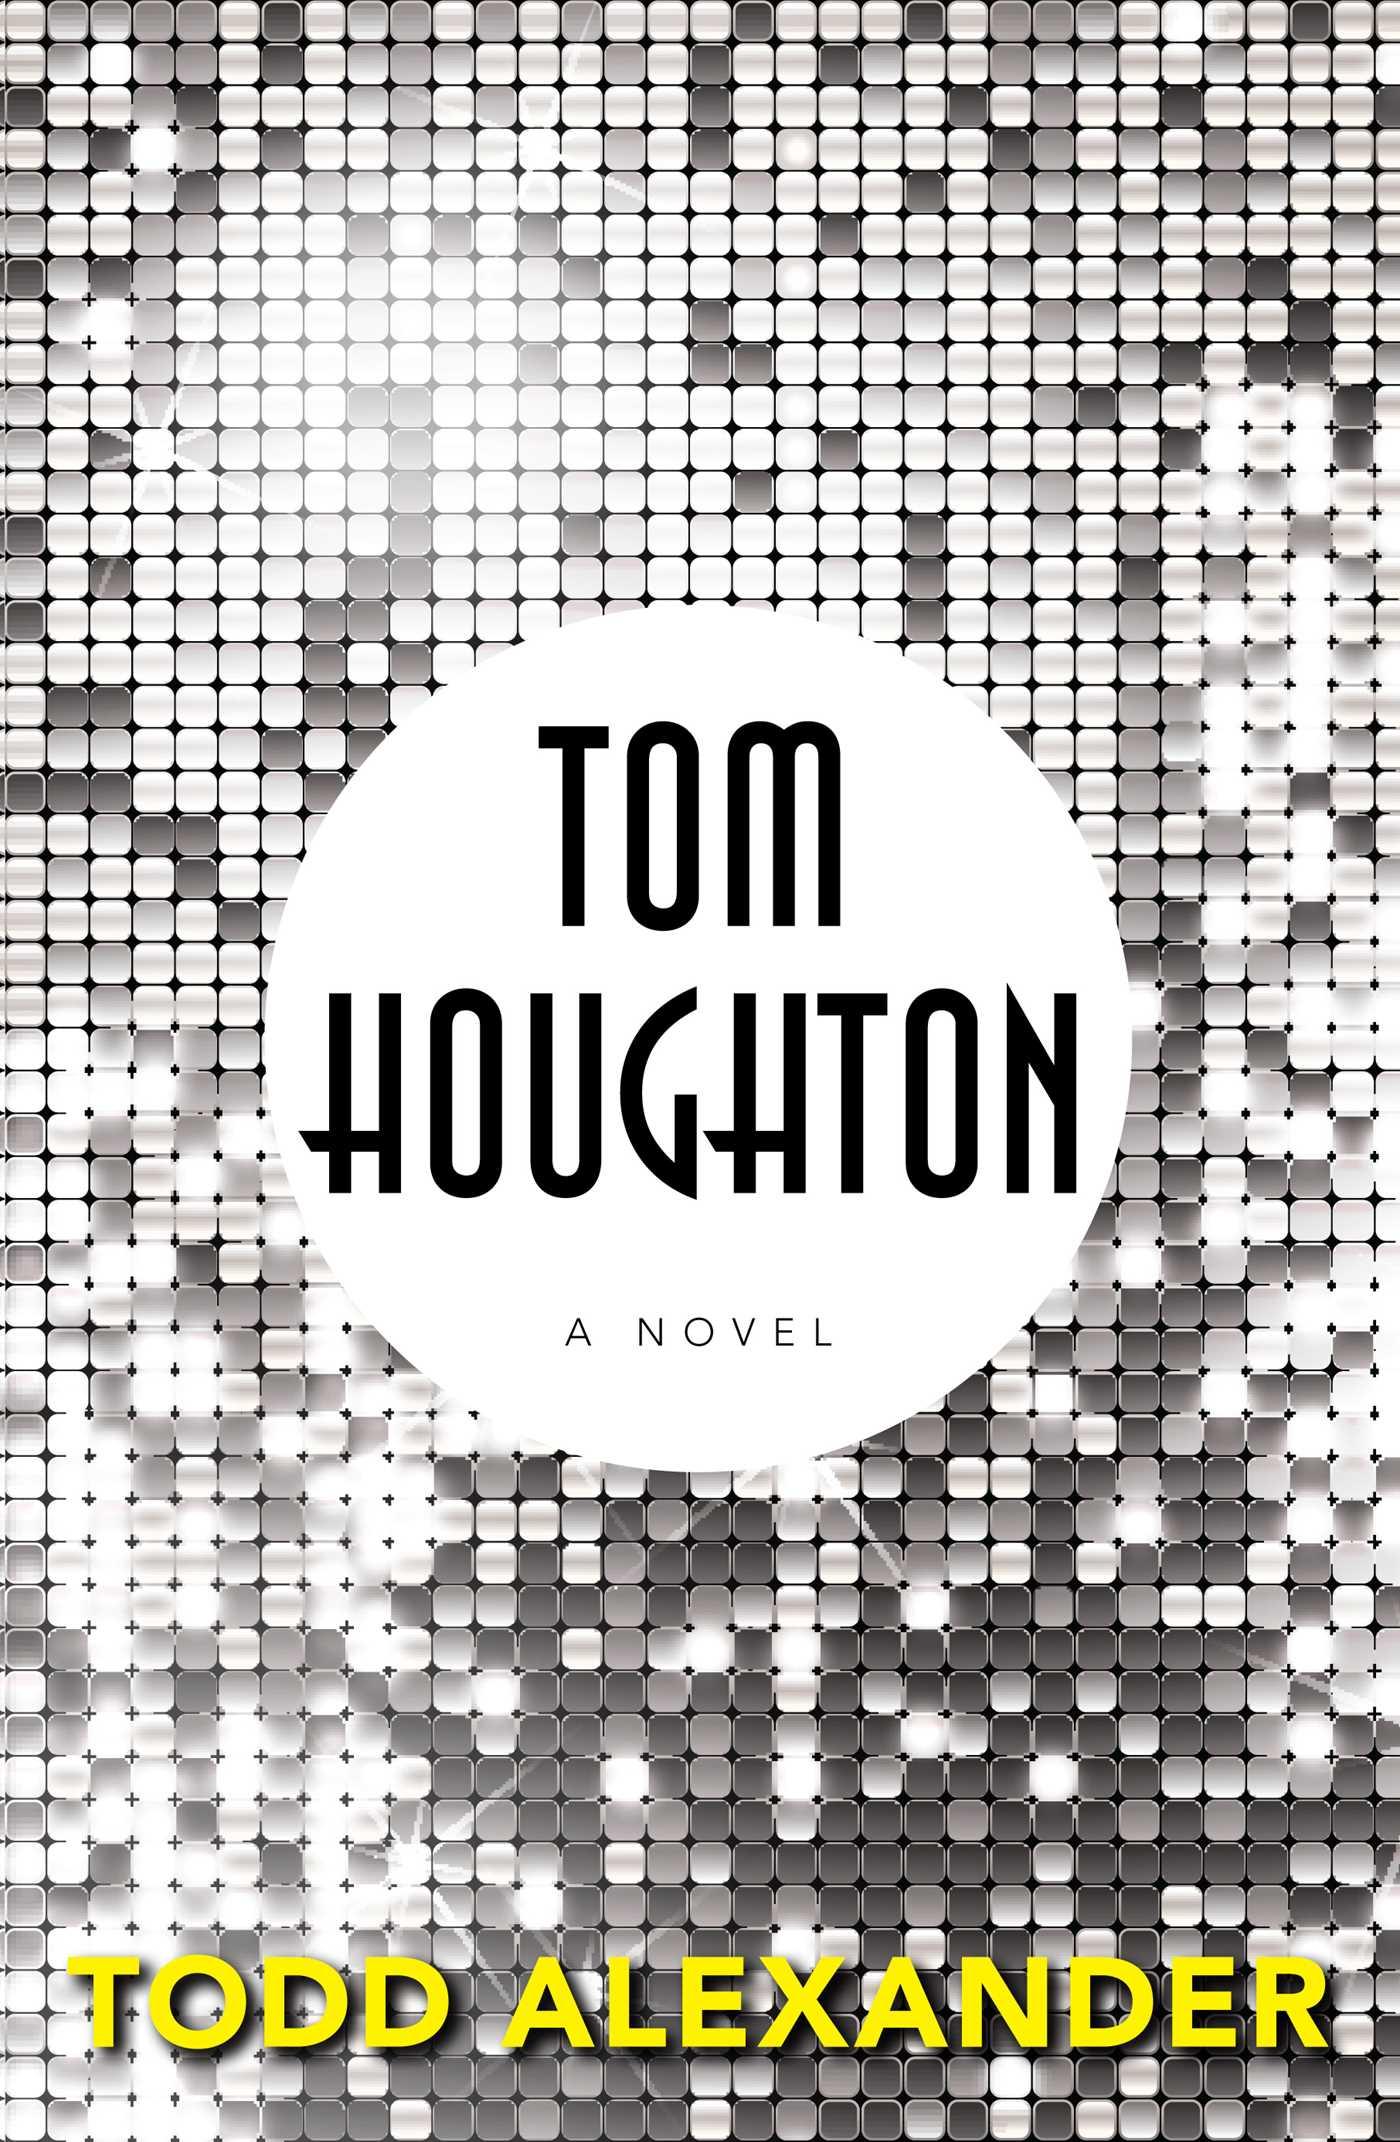 Tom houghton 9781925184556 hr